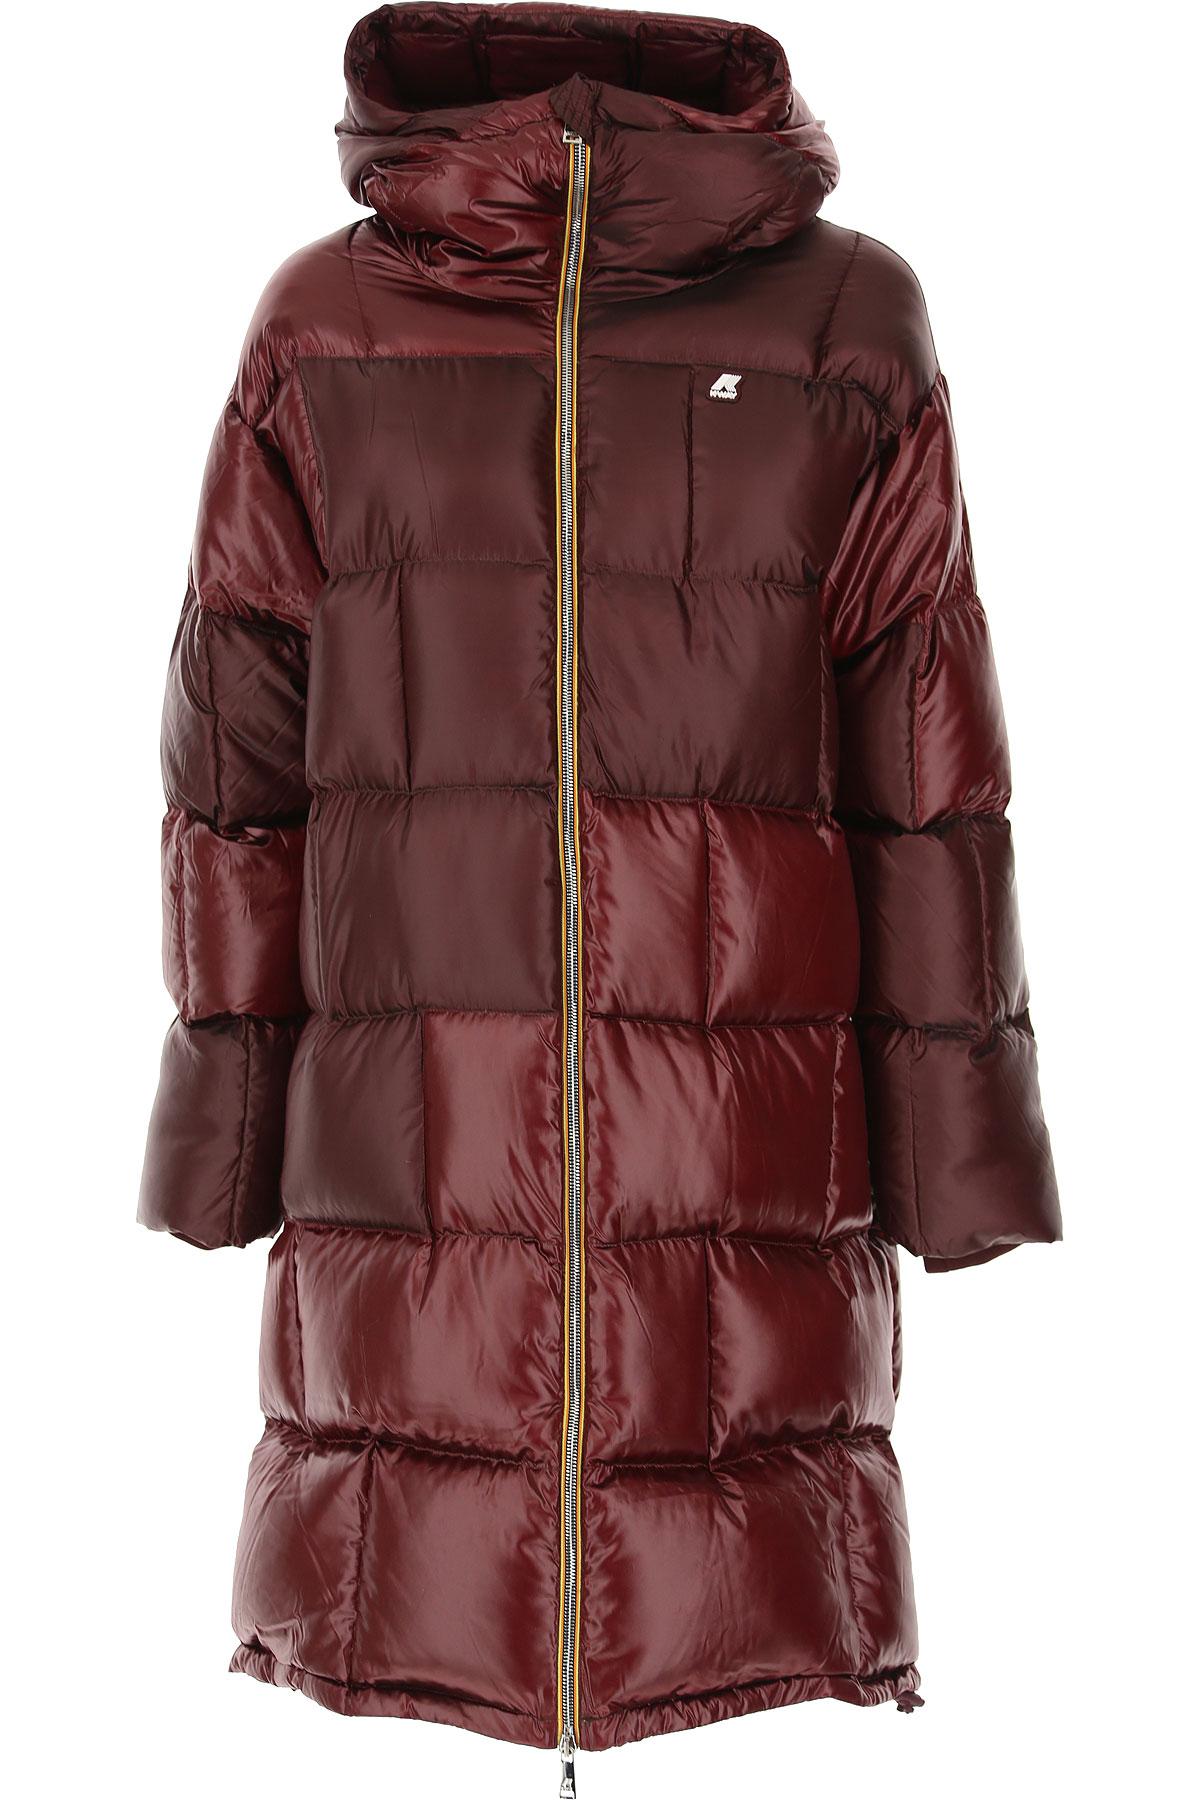 K-Way Down Jacket for Women, Puffer Ski Jacket, Cherry Black, polyester, 2019, 40 44